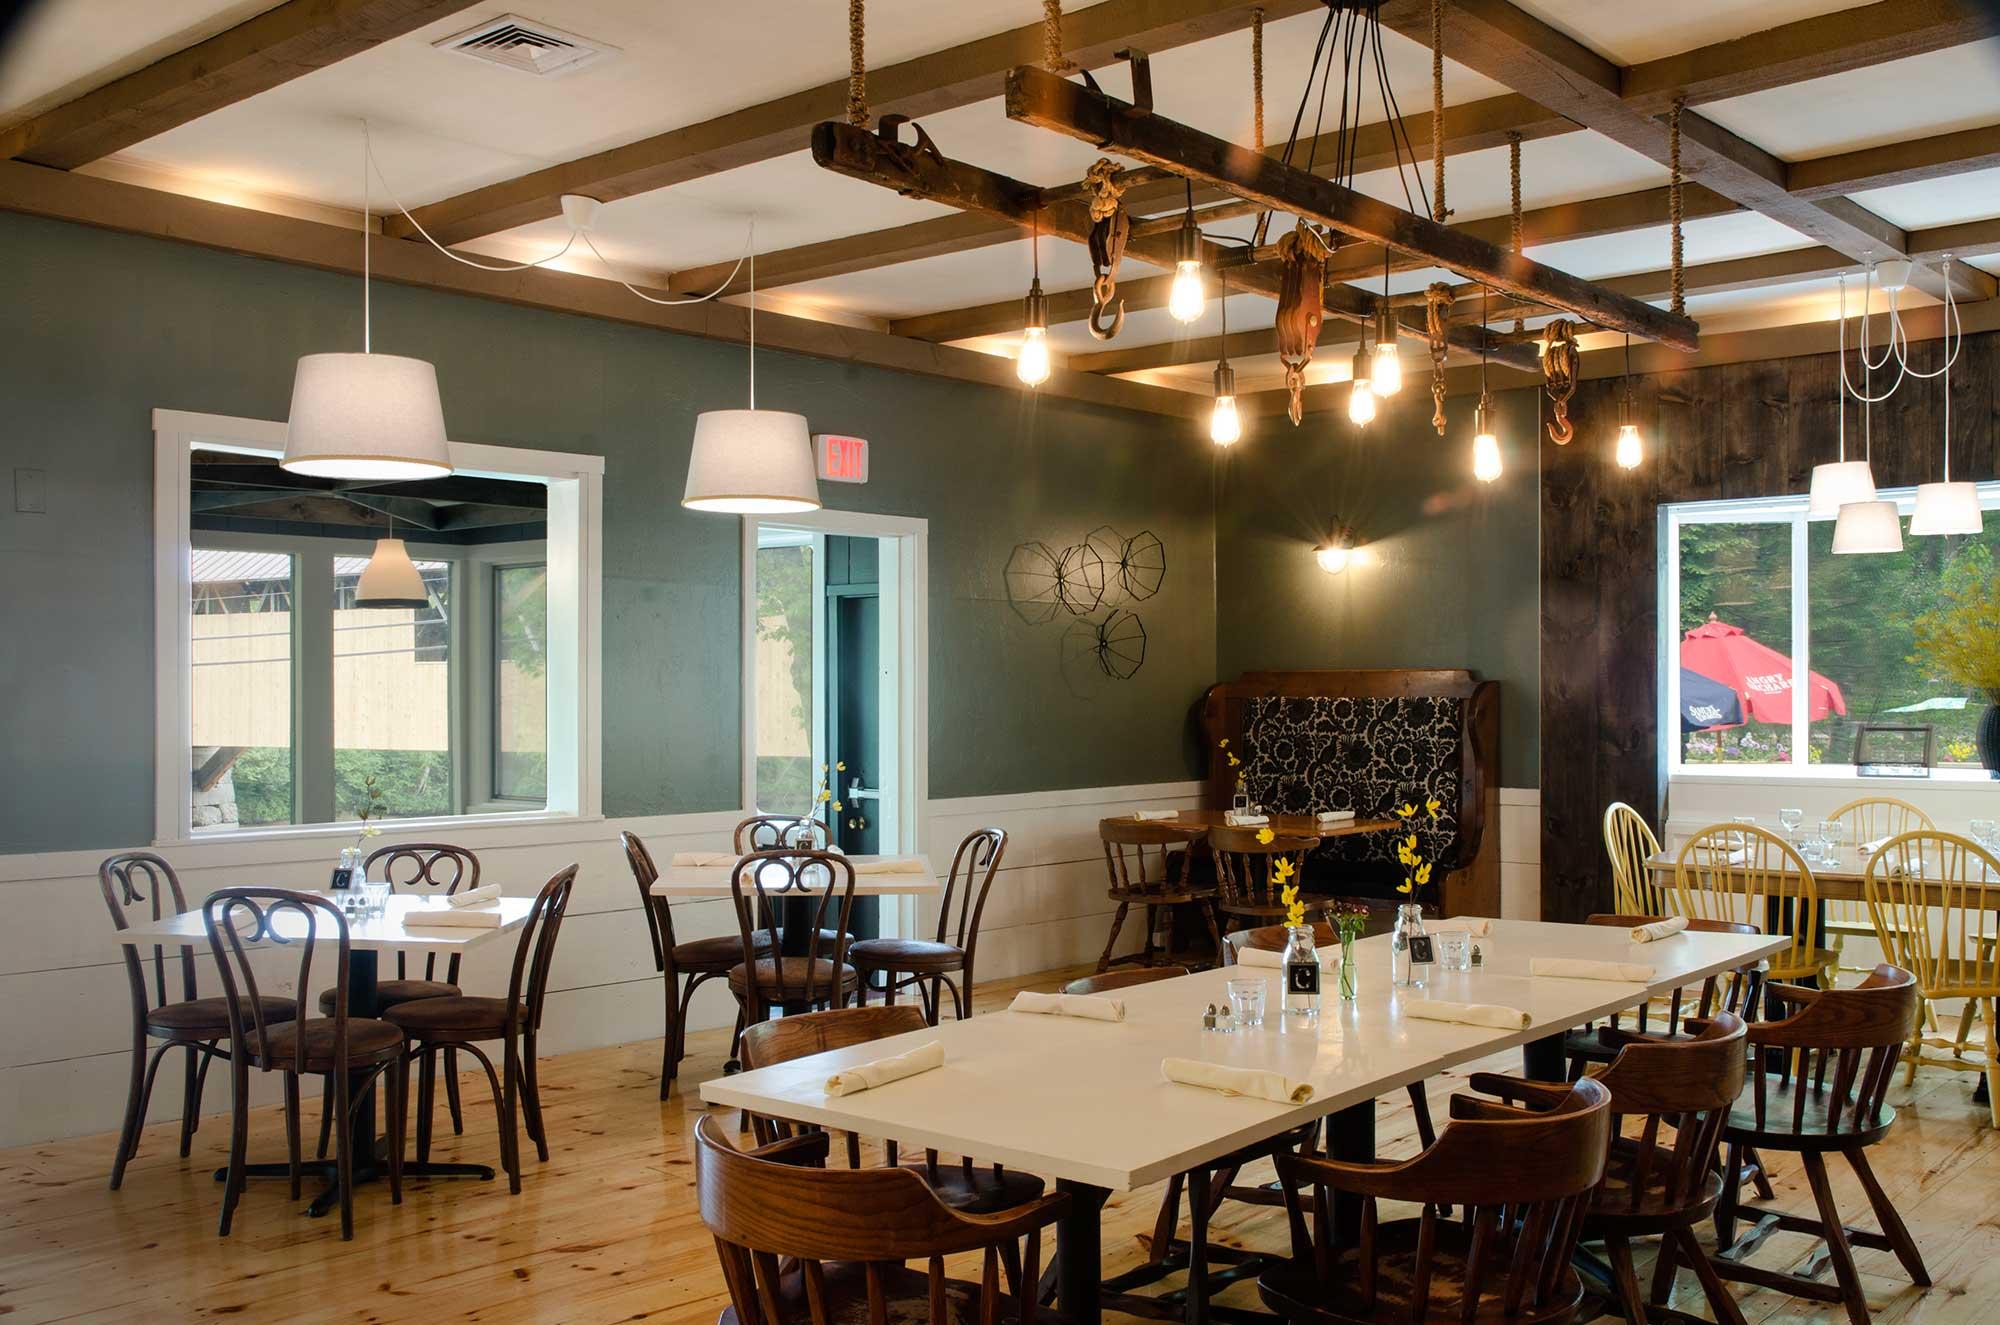 Menus The Covered Bridge Farm Table Restaurant Bar - Covered bridge farm table